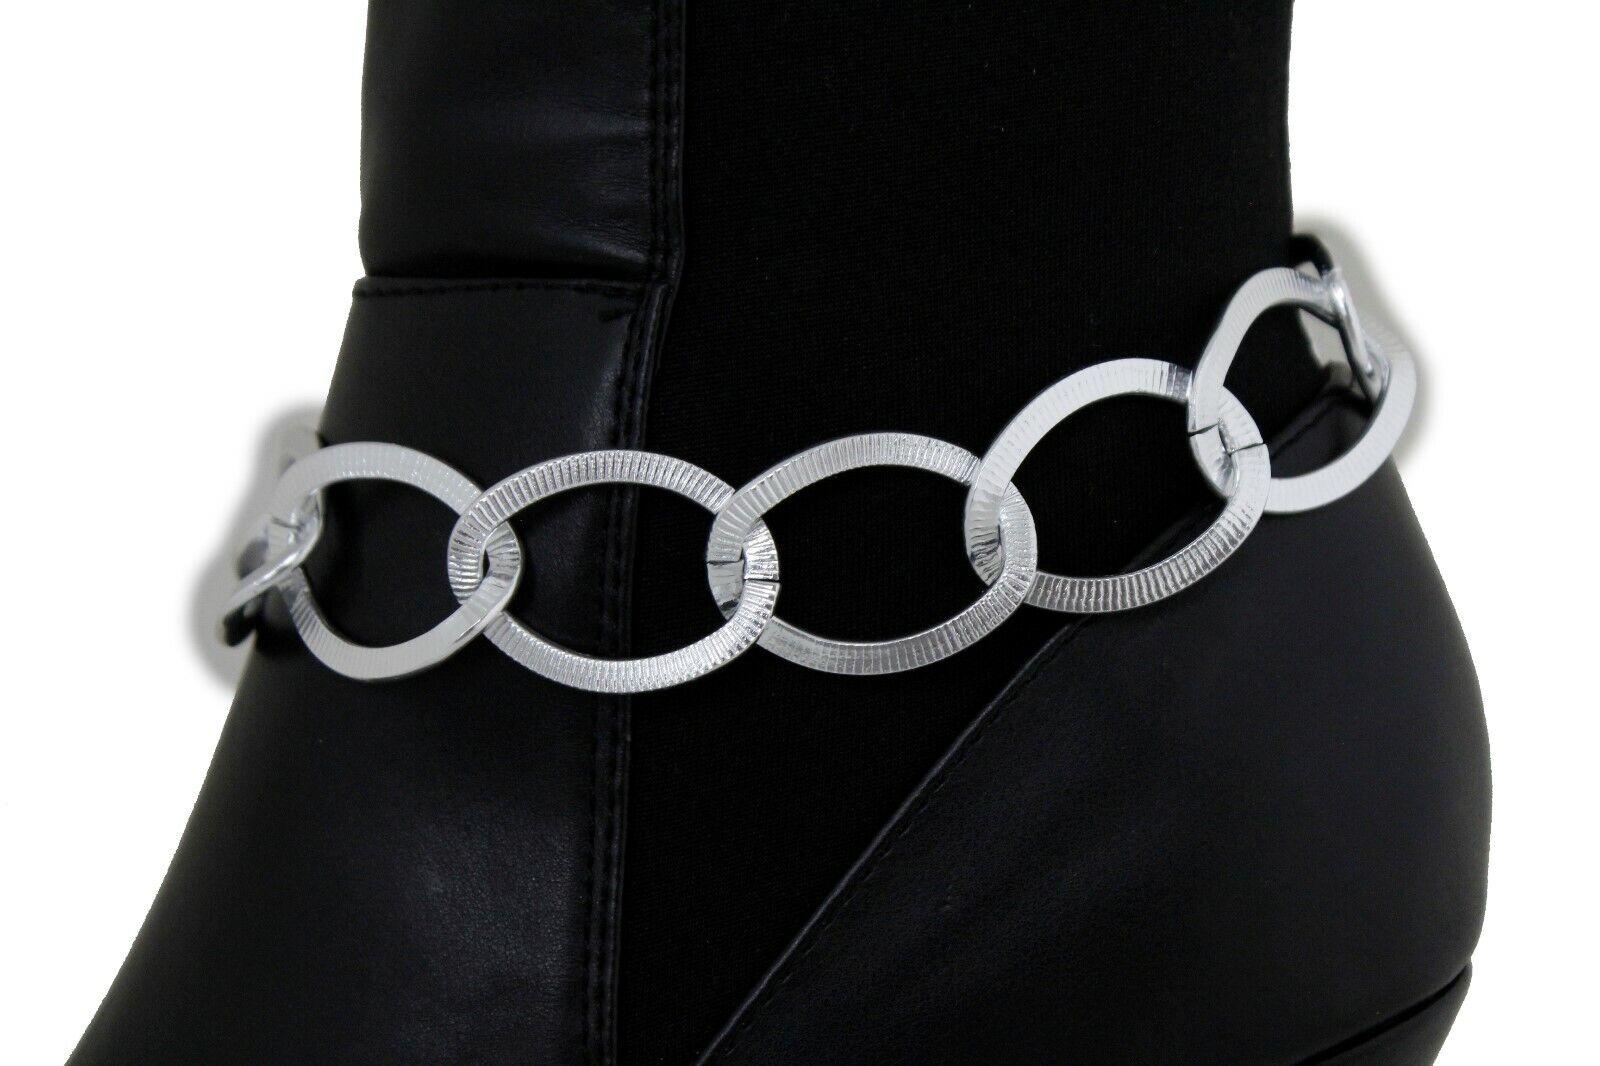 Sexy Women Silver Metal Boot Chain Bling Chunky Links Bracelet Shoe Charm Strap